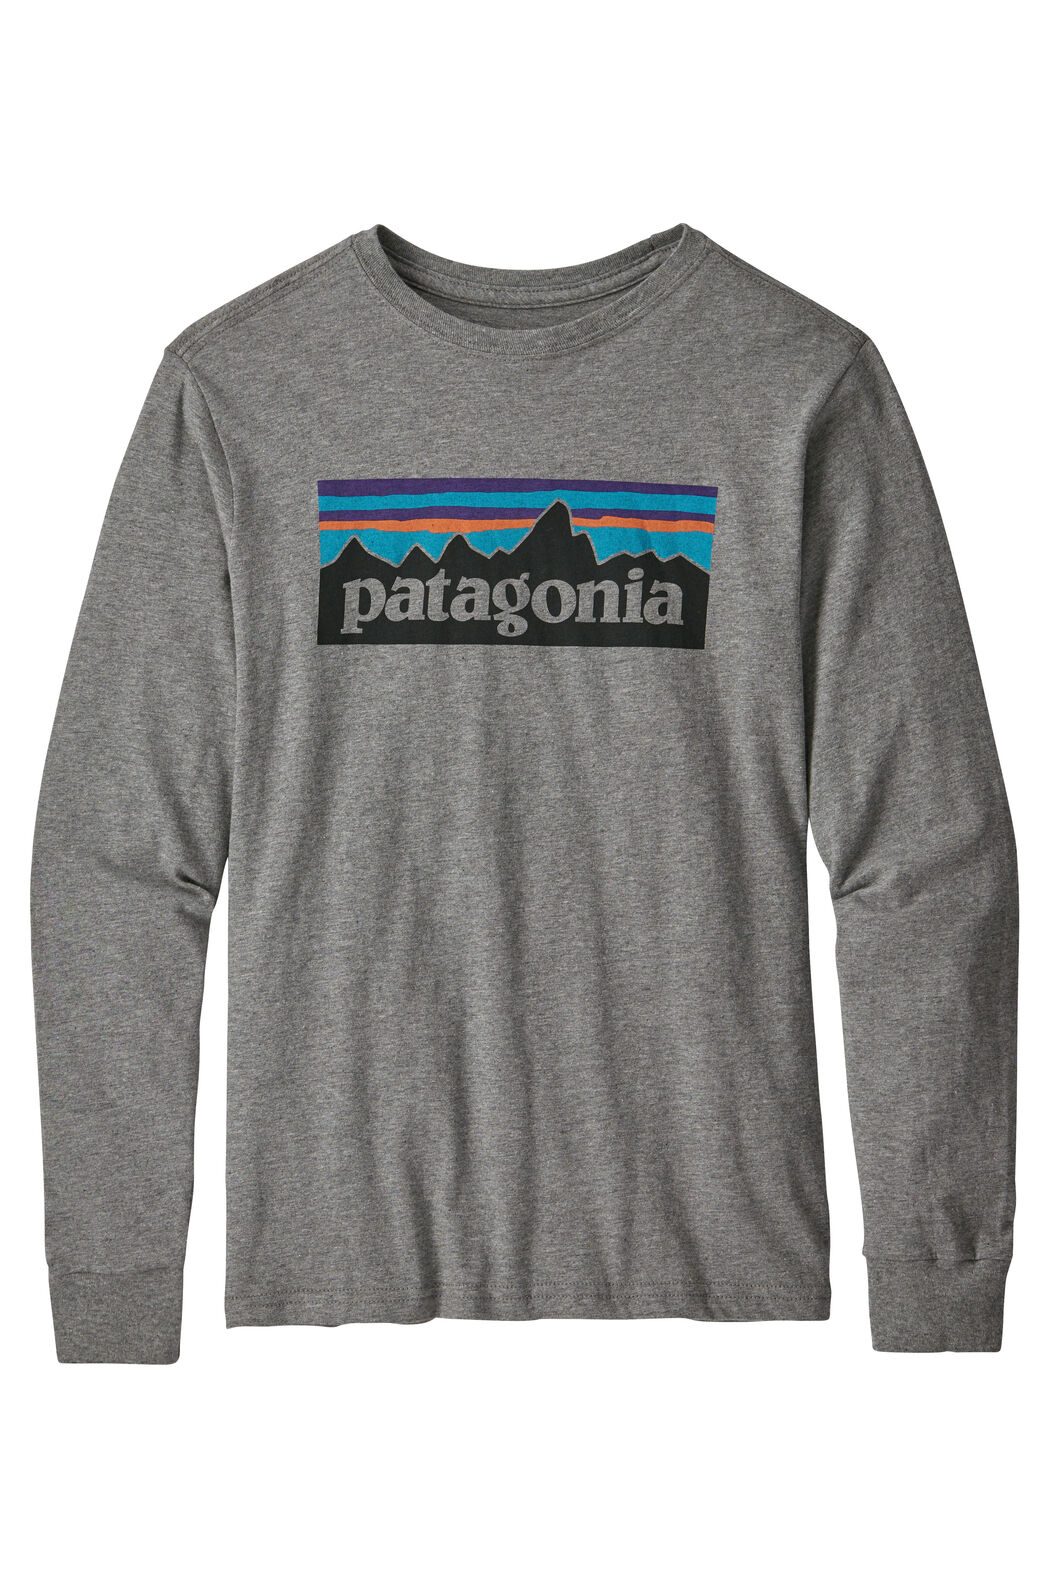 Patagonia L/S Graphic Organic T-Shirt, Grey Heather, hi-res